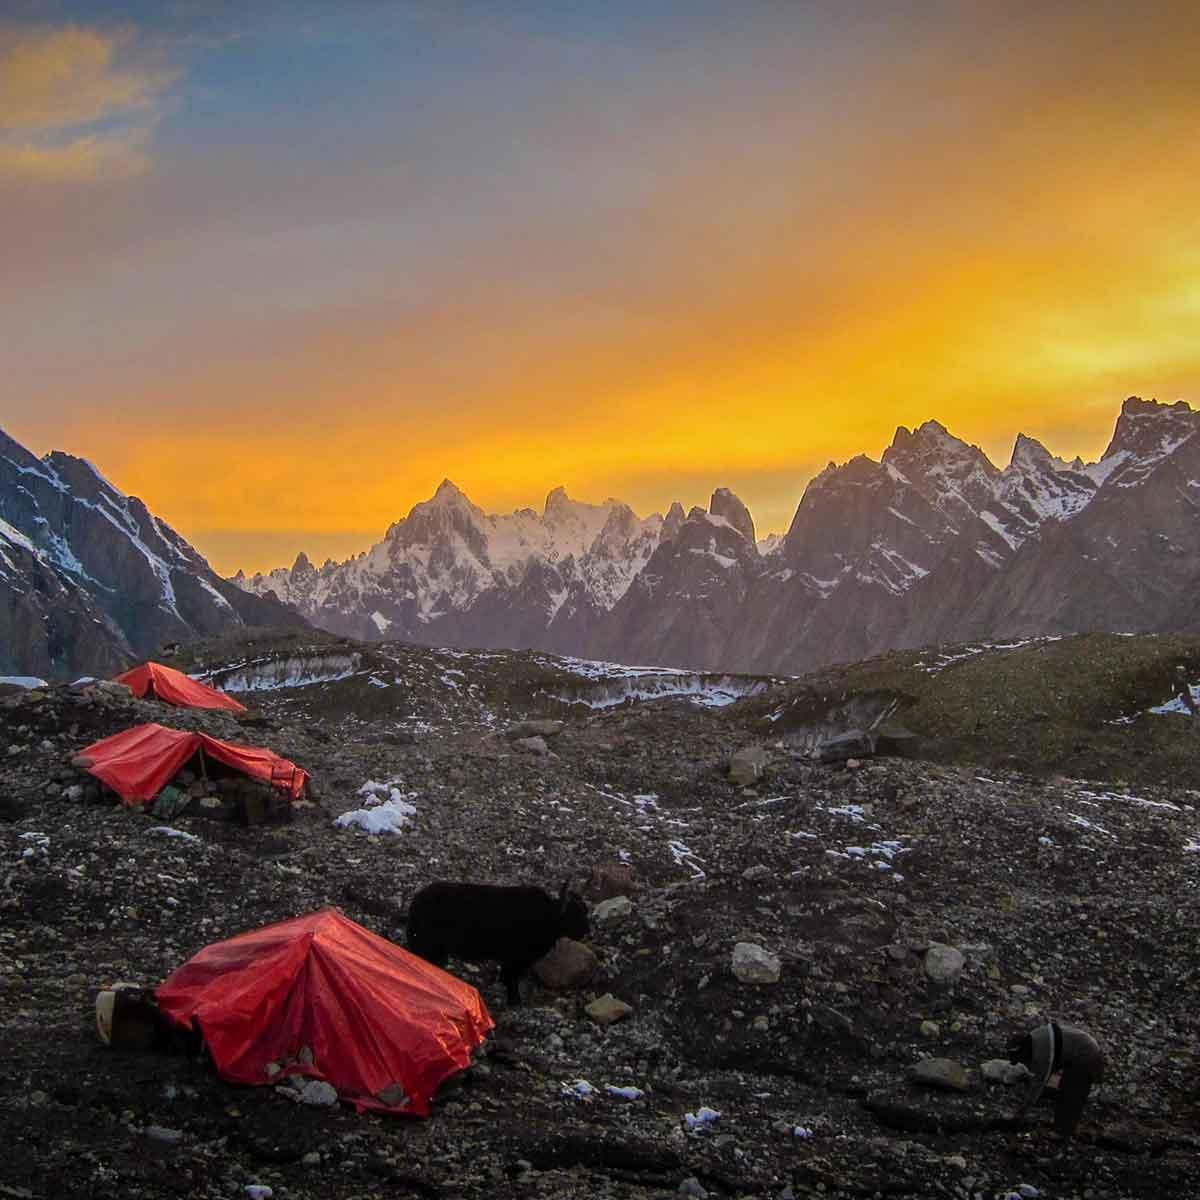 tiendas de campaña en alta montaña